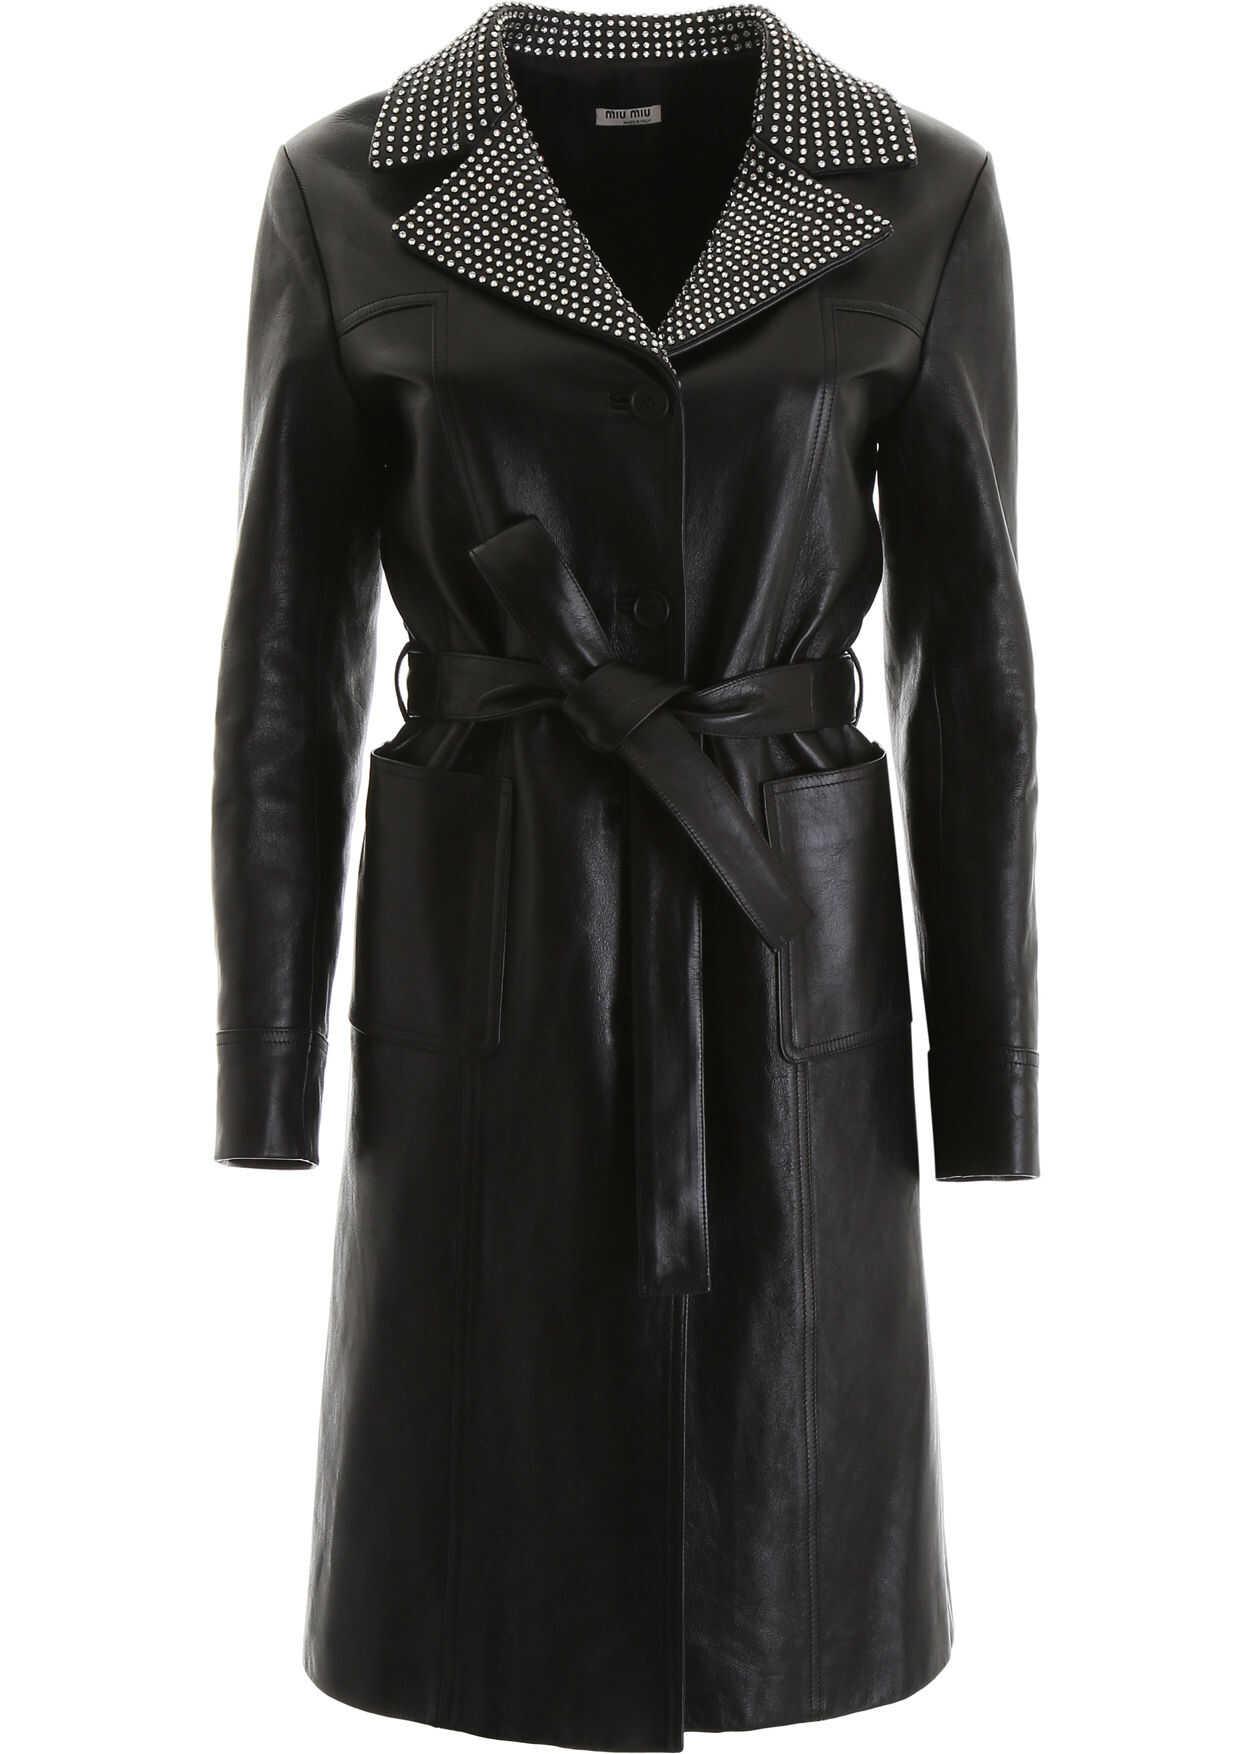 Miu Miu Leather Coat With Crystals NERO